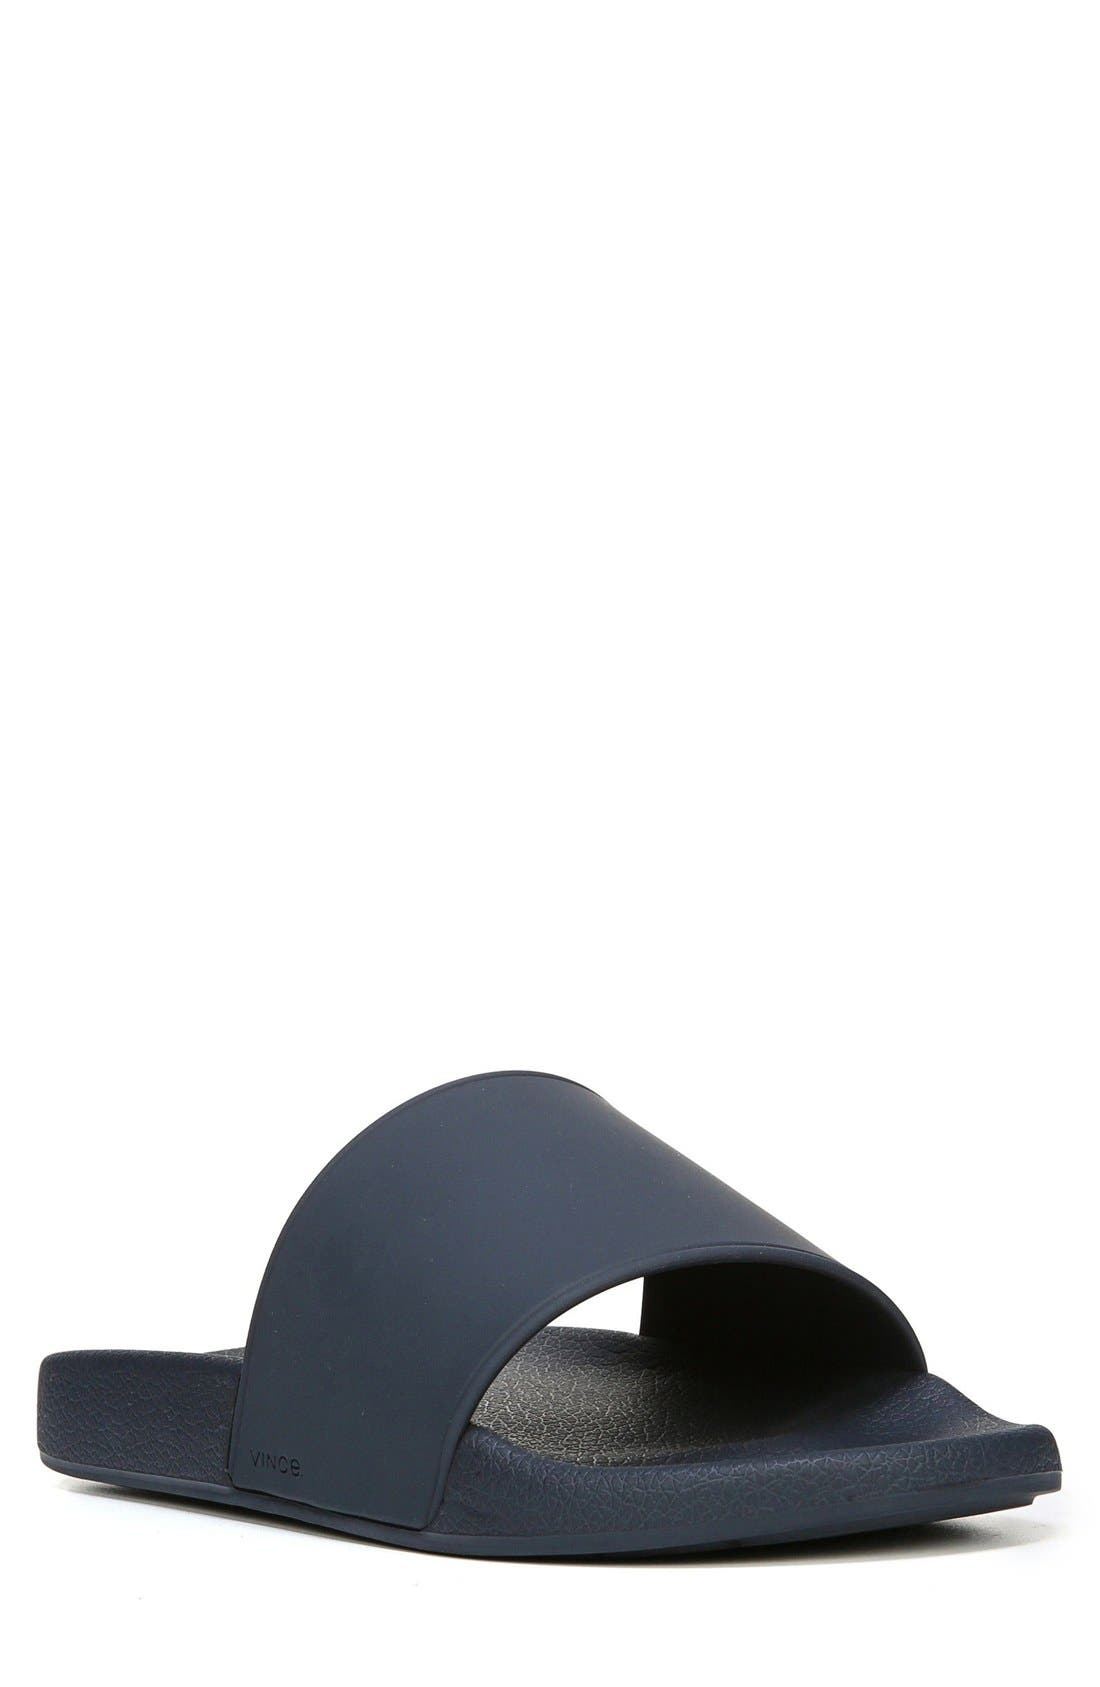 Westcoast Sport Sandal,                         Main,                         color, Coastal Blue